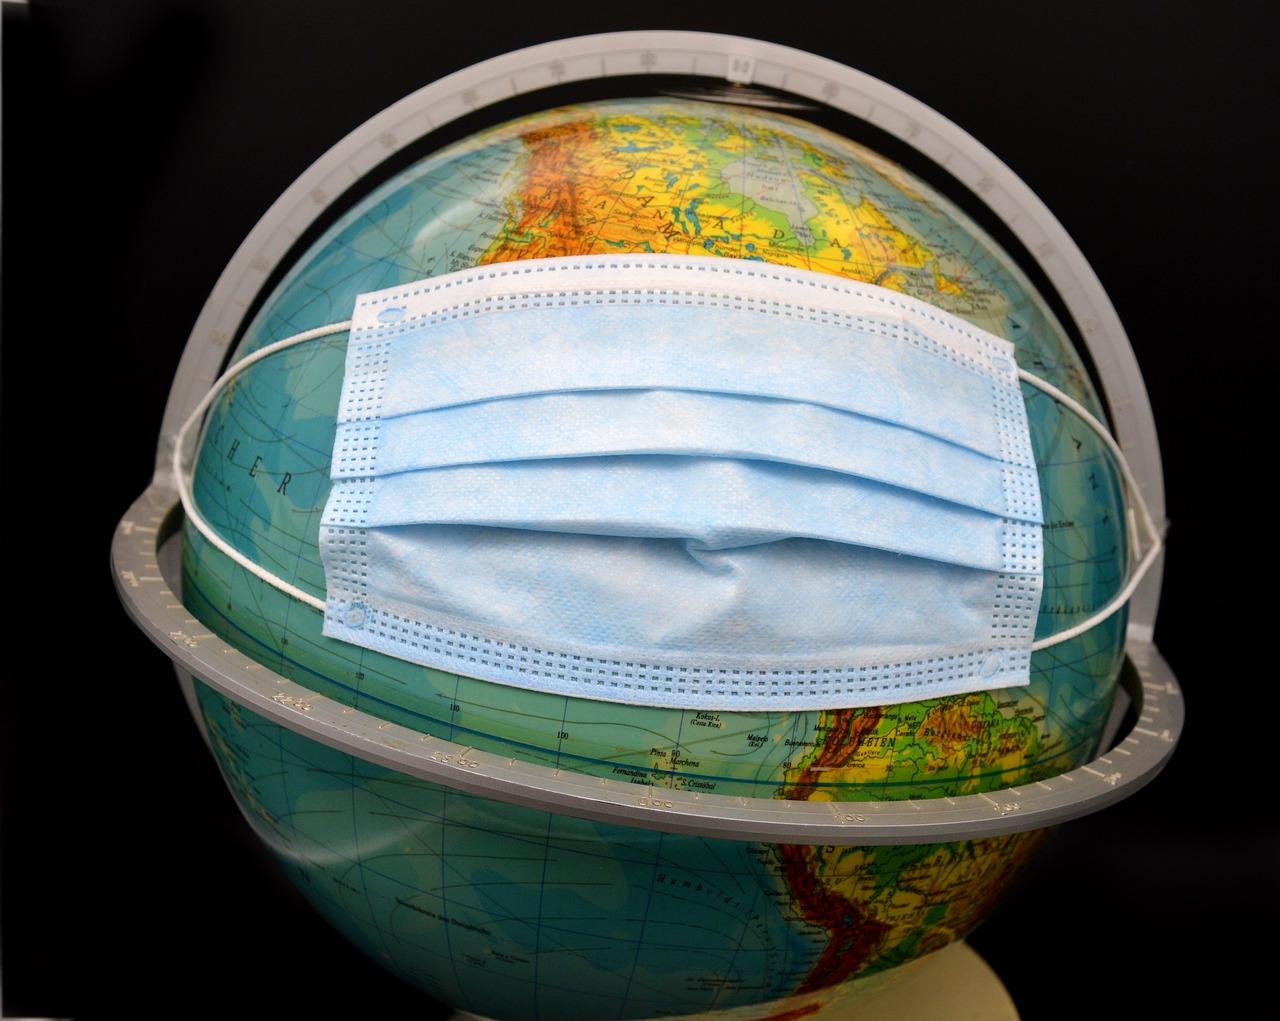 Global COVID-19 cases top 8.7M: Johns Hopkins University